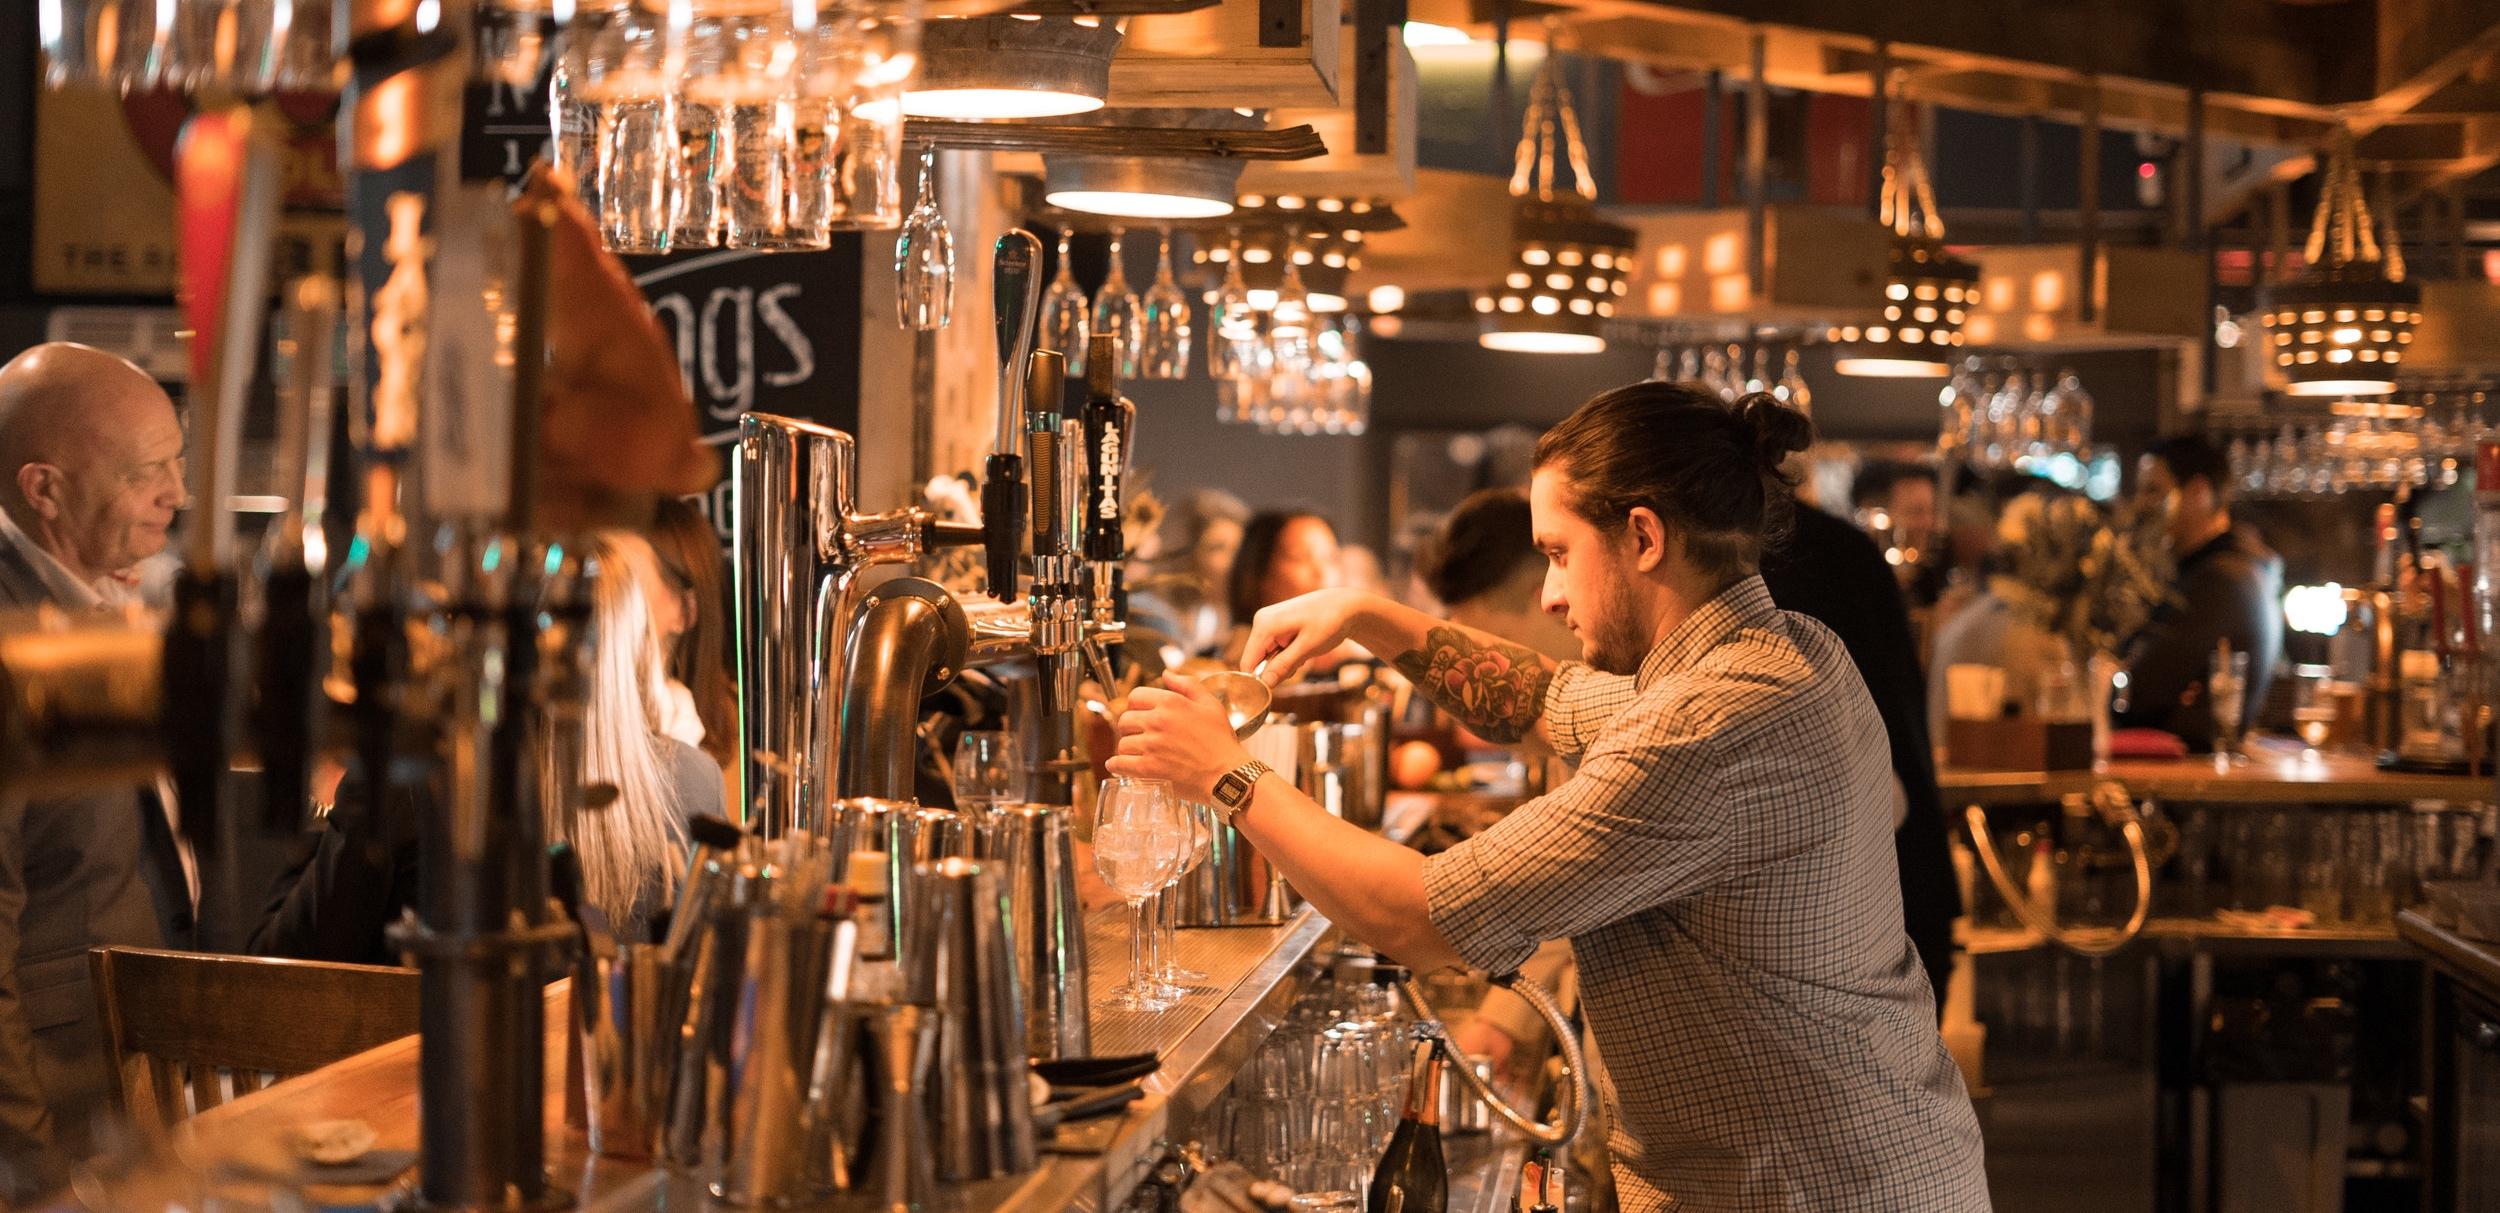 Dancing-Moose-Bournemouth-Bar-Restaurant-Cocktails-Burgers-Pub.jpg